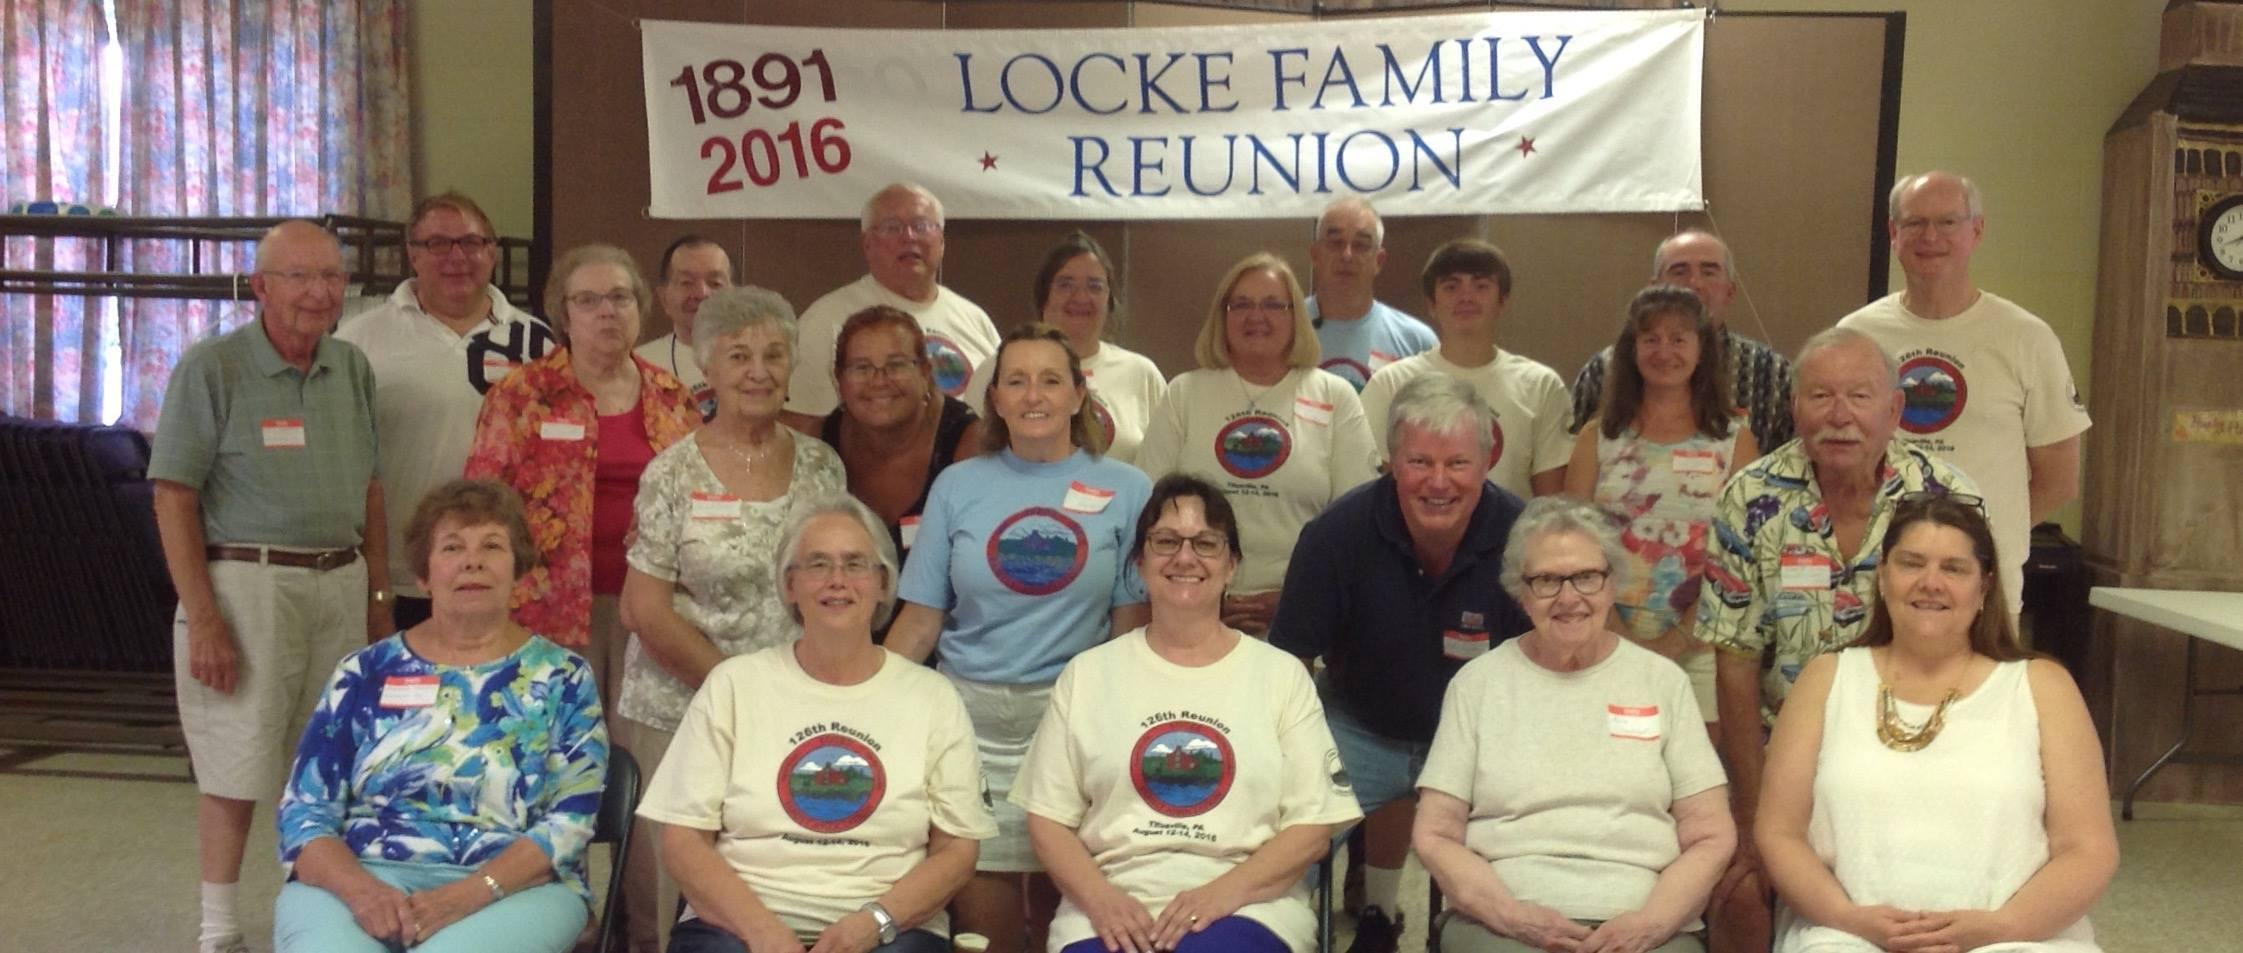 2016 Reunion Titusville PA